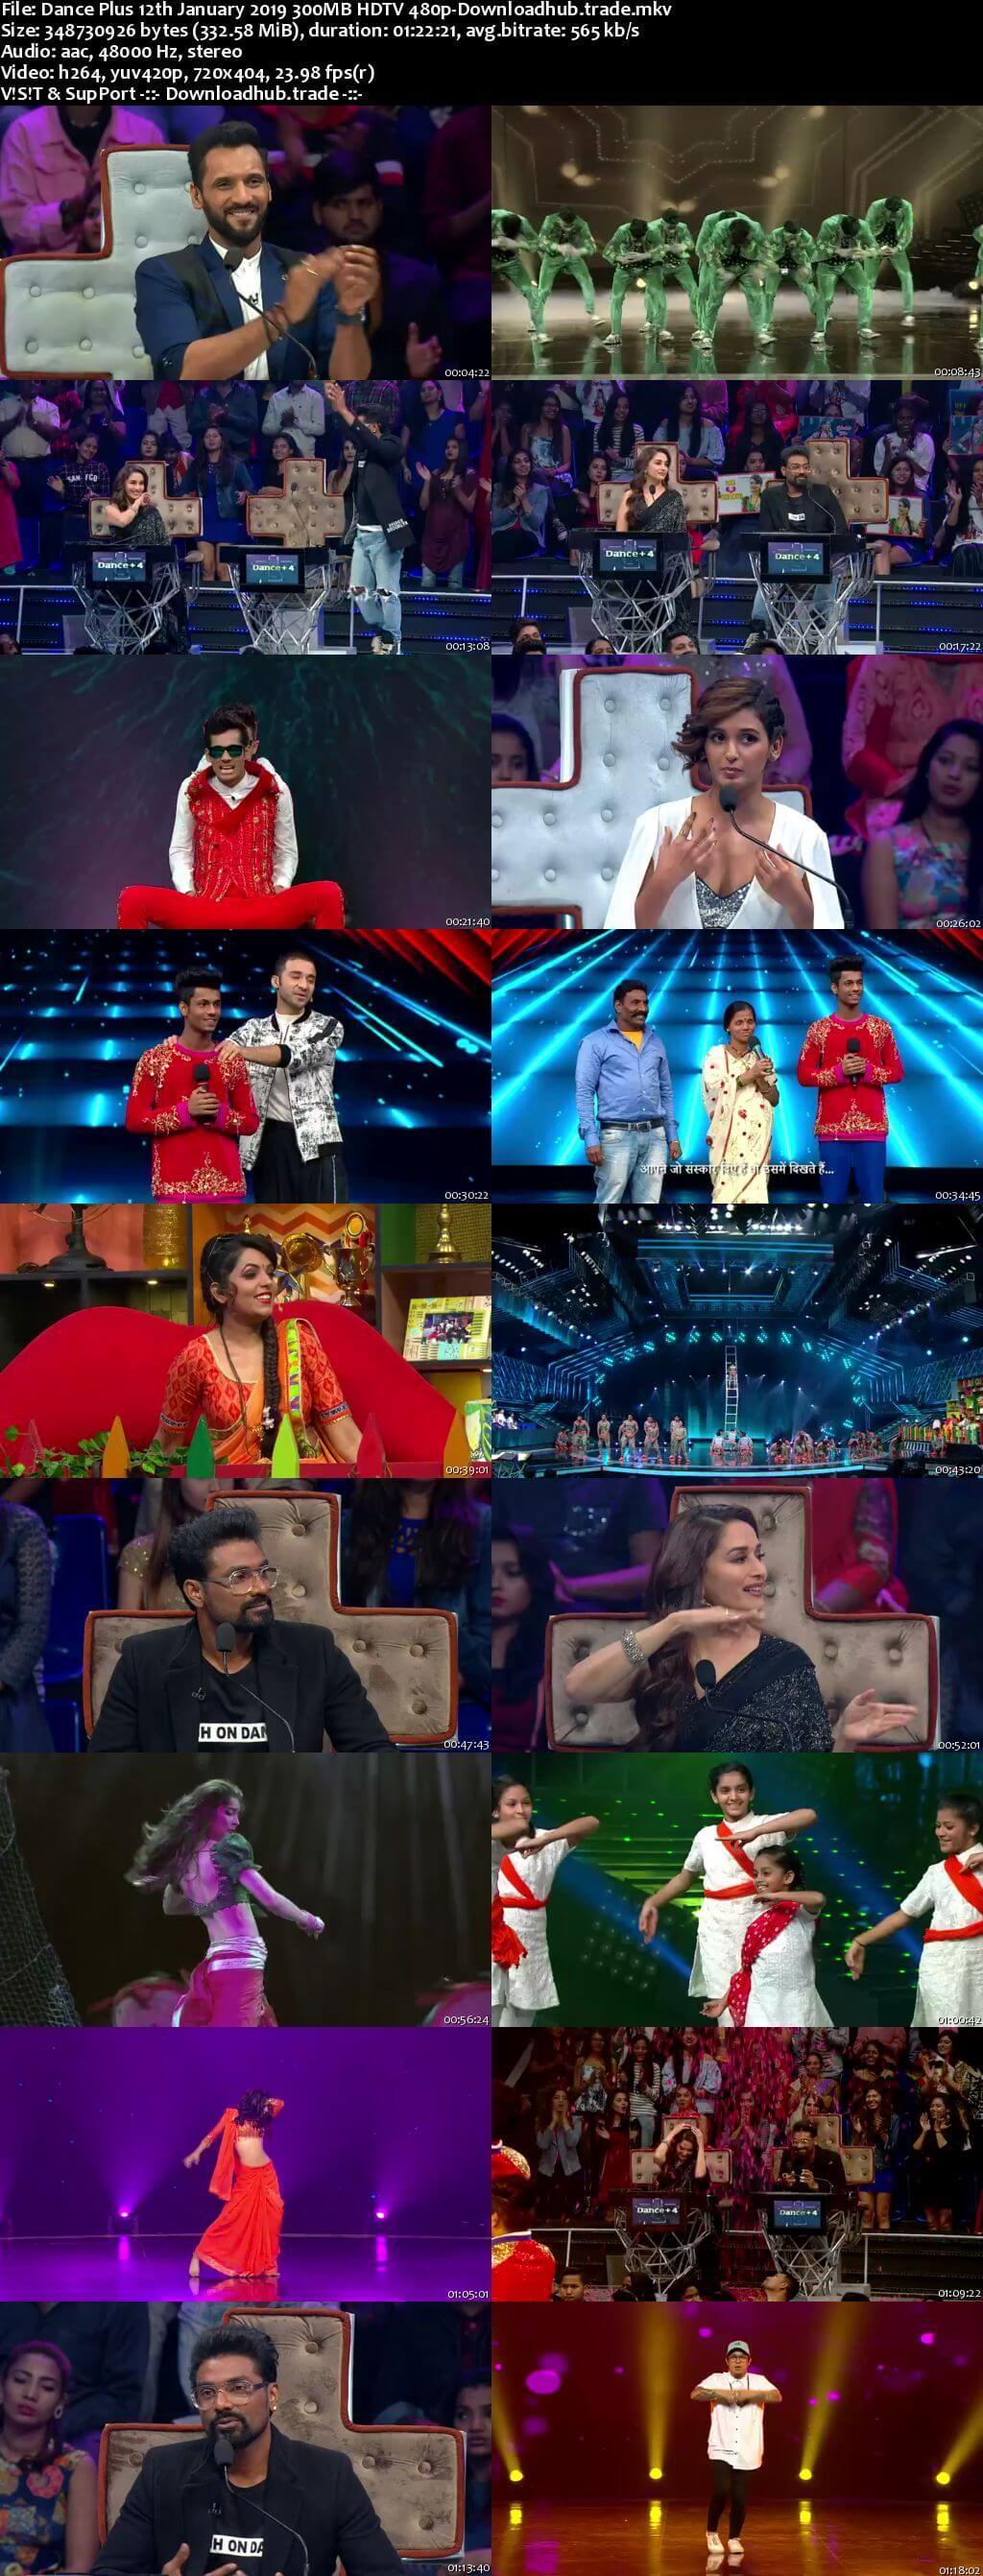 Dance Plus Season 4 12 January 2019 Episode 28 HDTV 480p